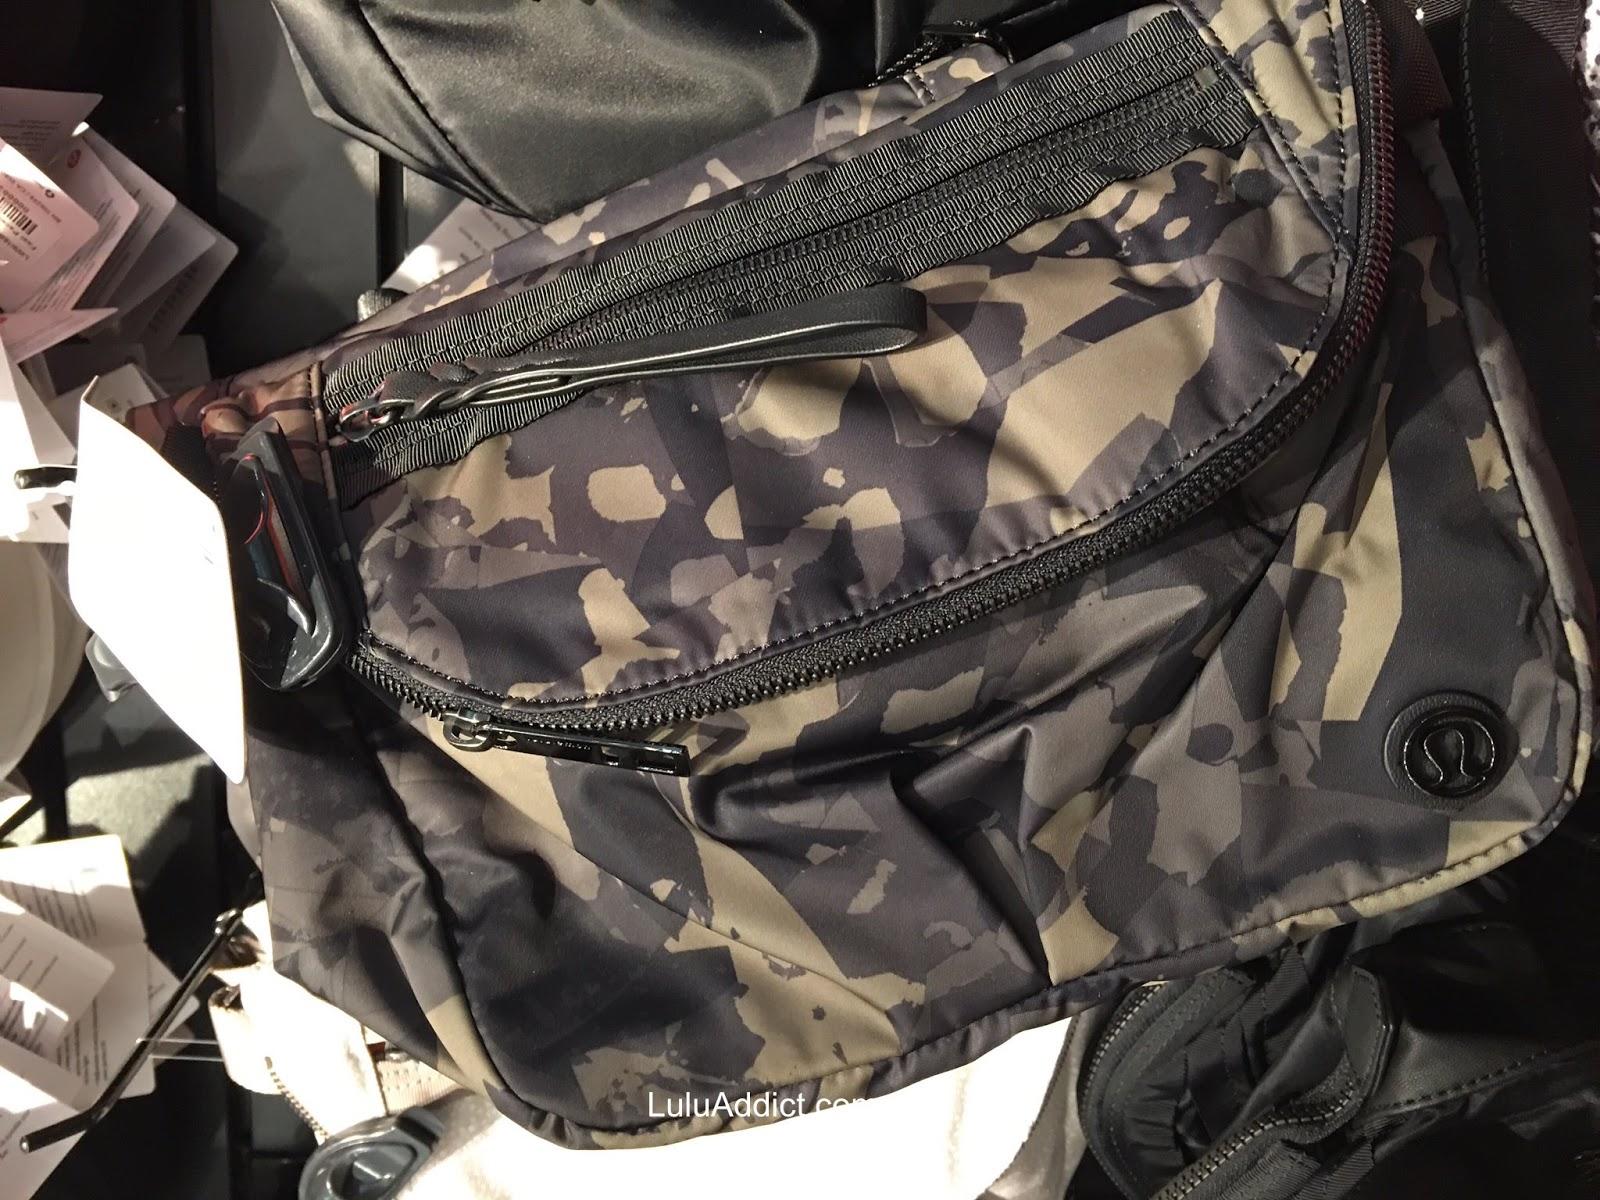 dd9e1ca2c8 Lululemon Addict  Pop Cut Fatigue Festival Bag in US Stores and More